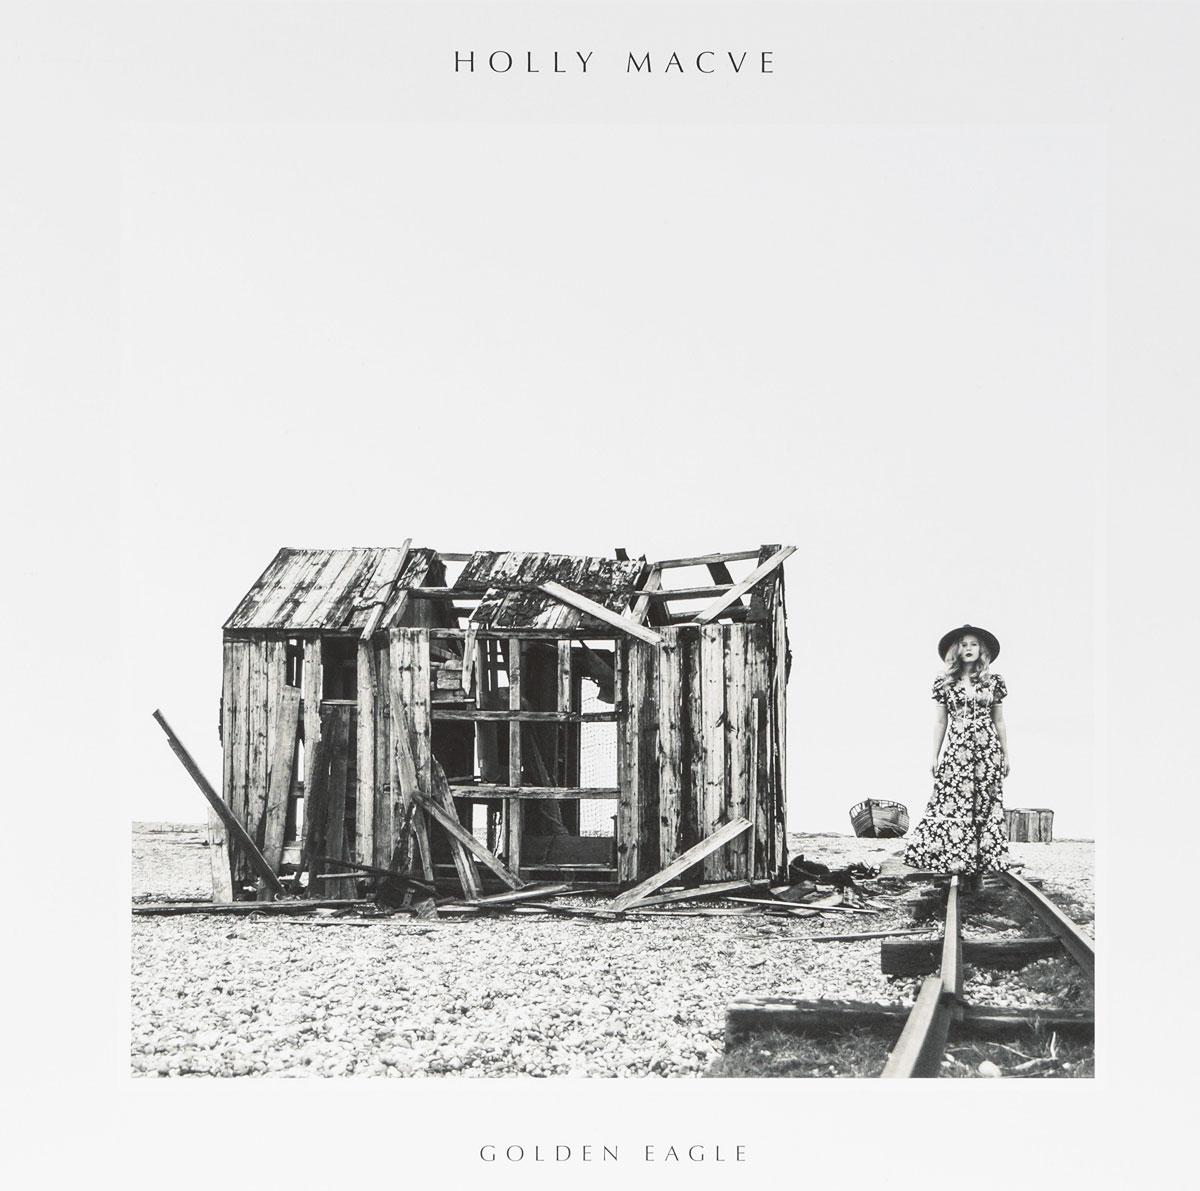 цена на Macve Holly Holly Macve. Golden Eagle (LP)